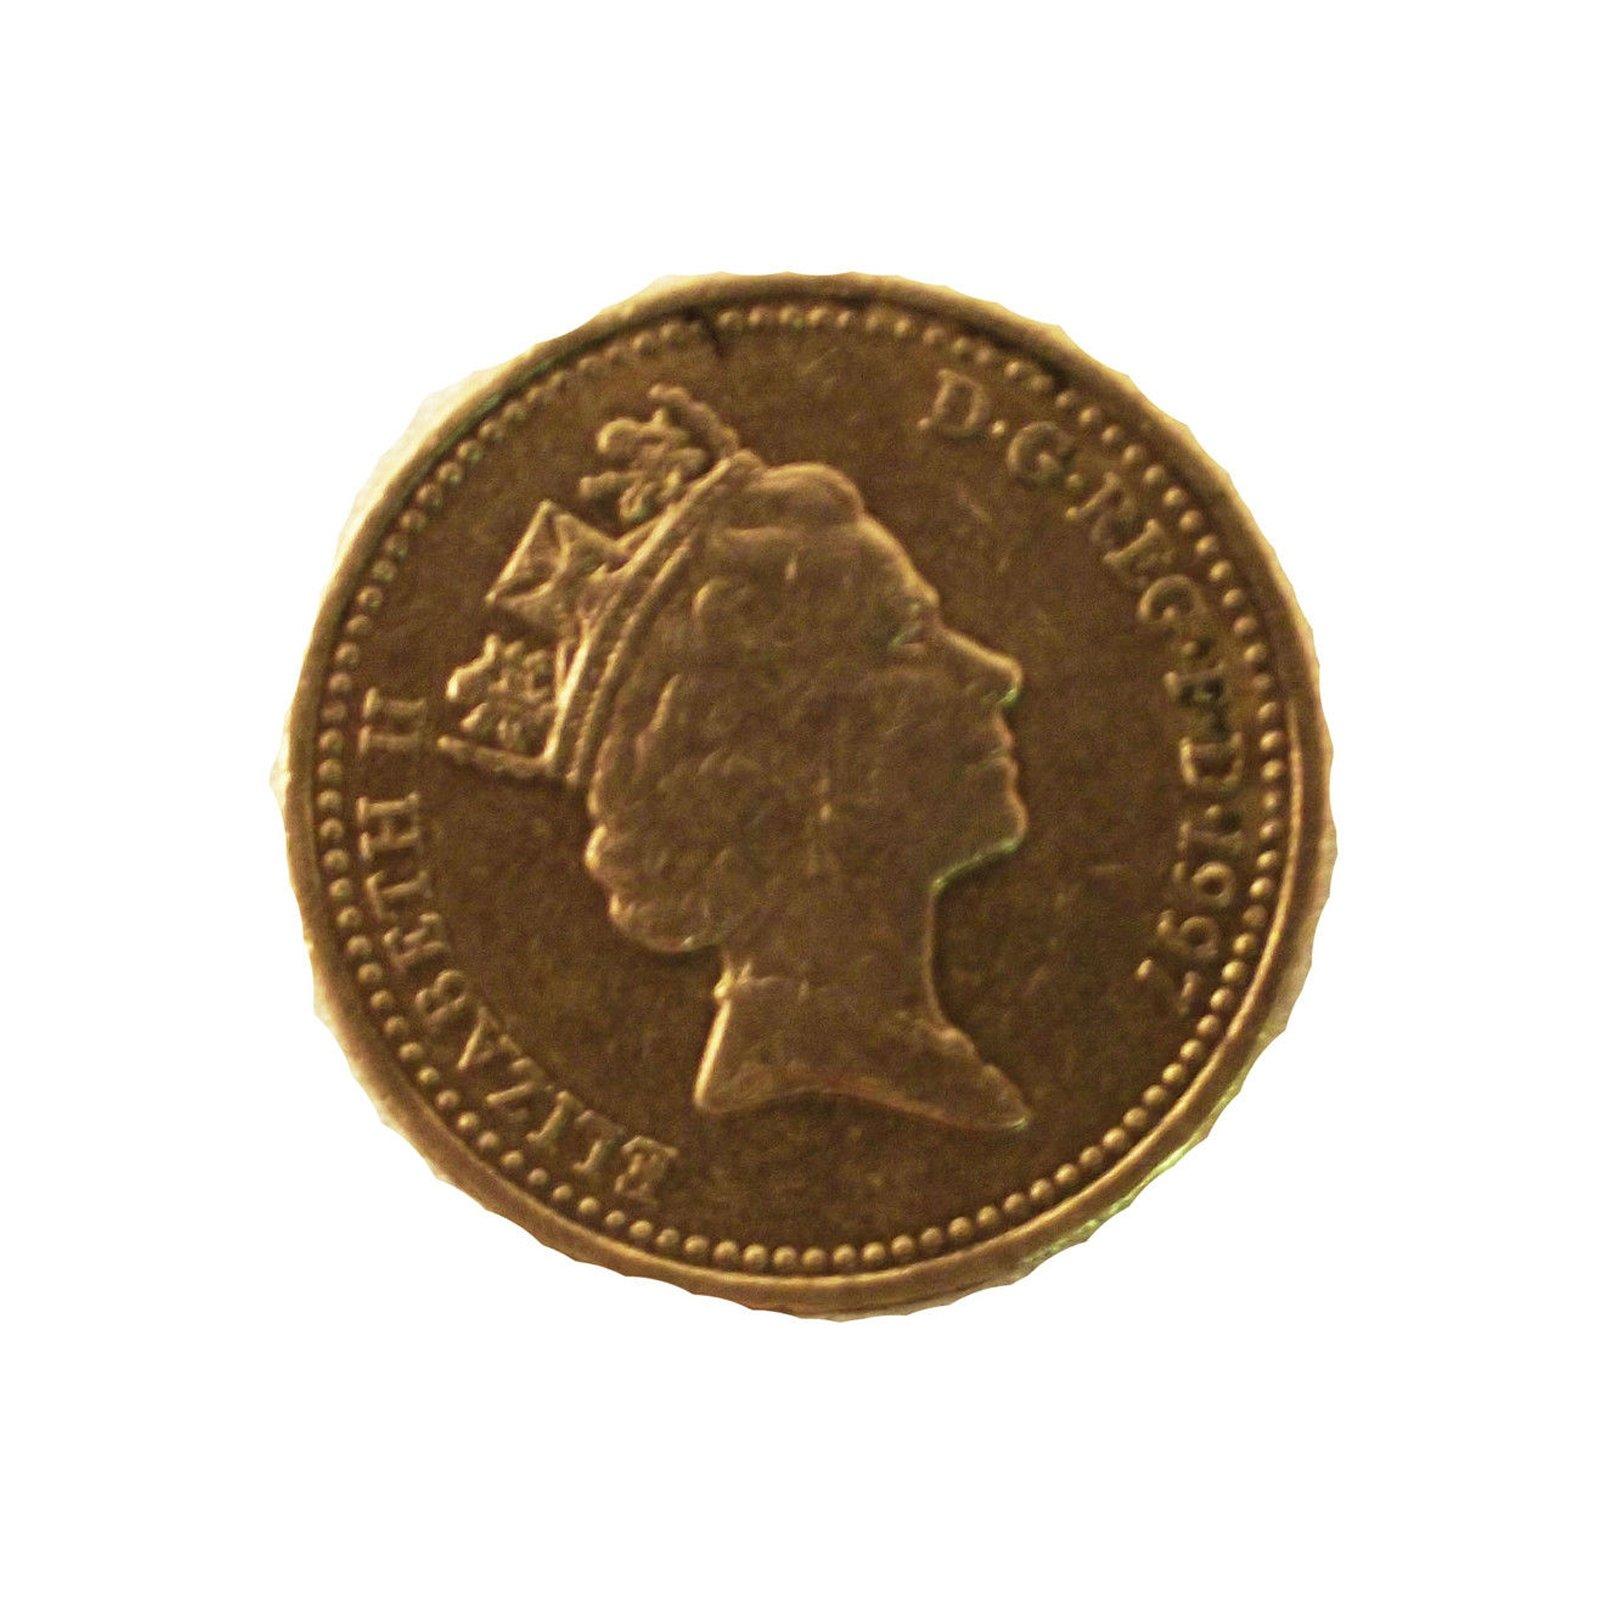 MicroSD Covert Spy Coin Secret Compartment - Authentic British Pound